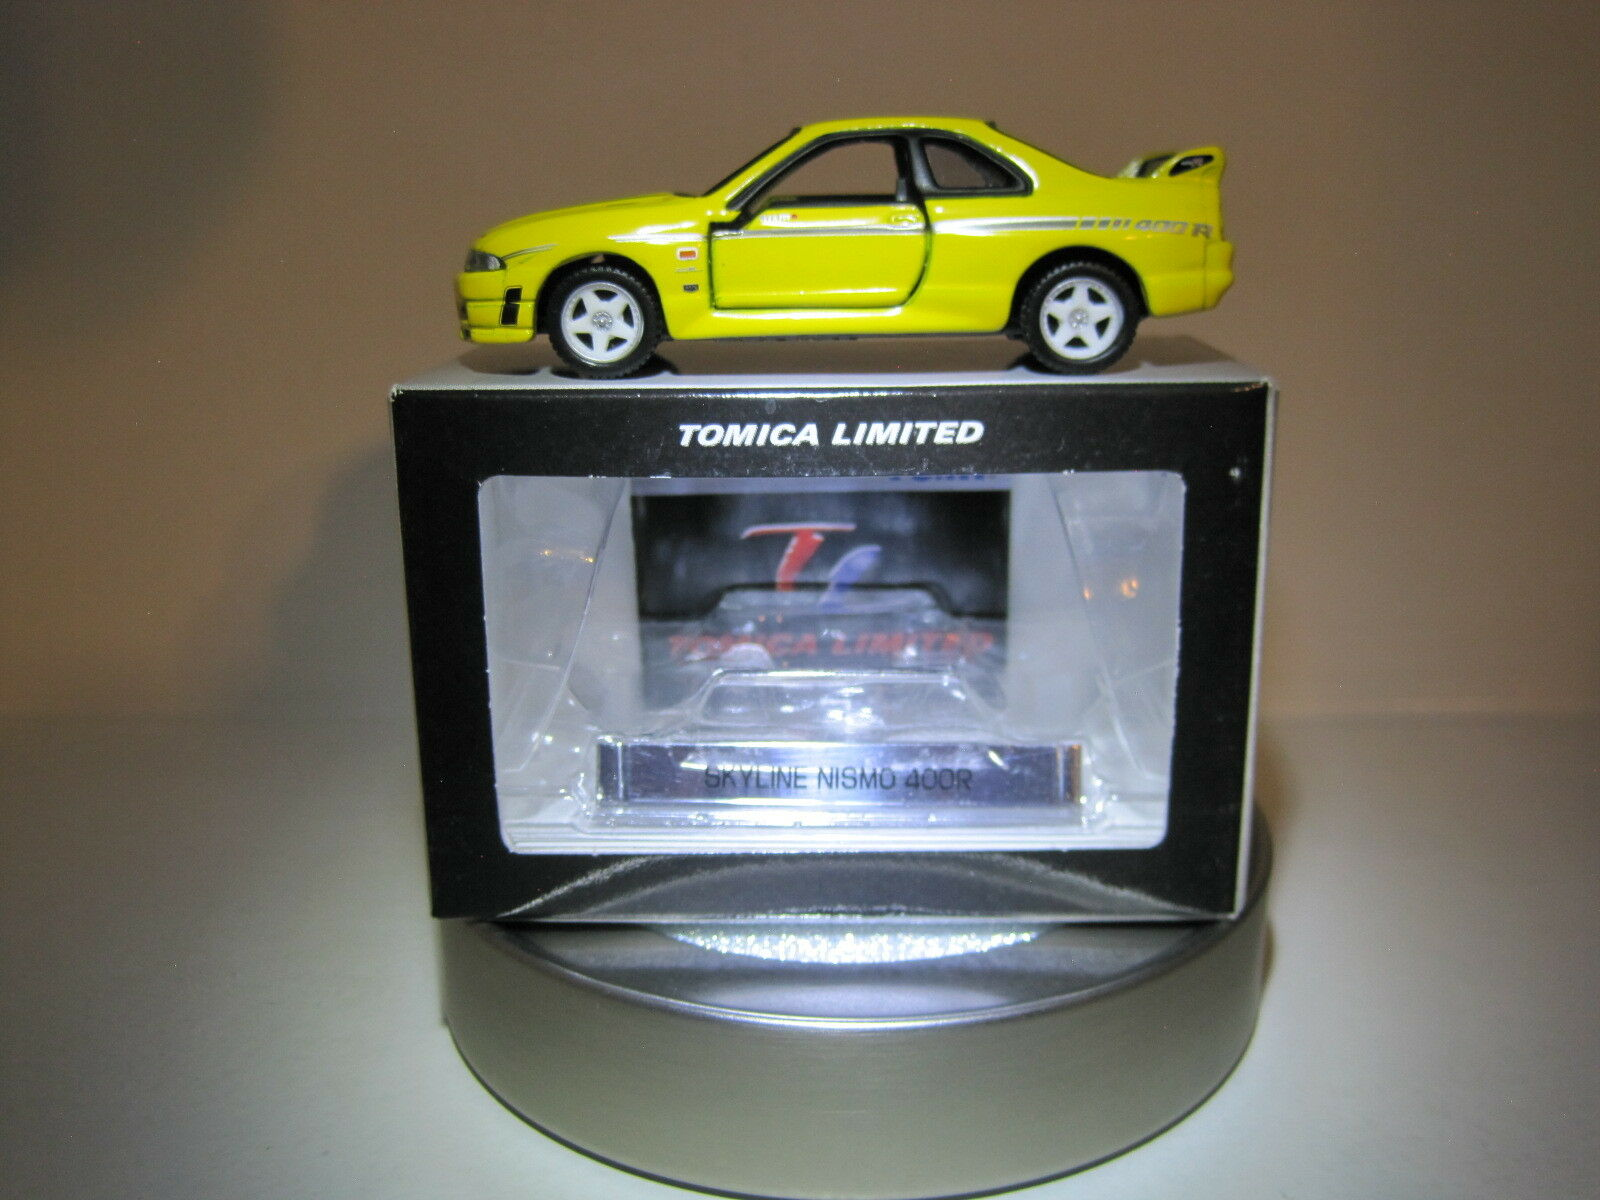 Tomica Limited 20 '96 Nissan Skyline GT-R 33 Nismo 400R 1 60 Die cast Mint